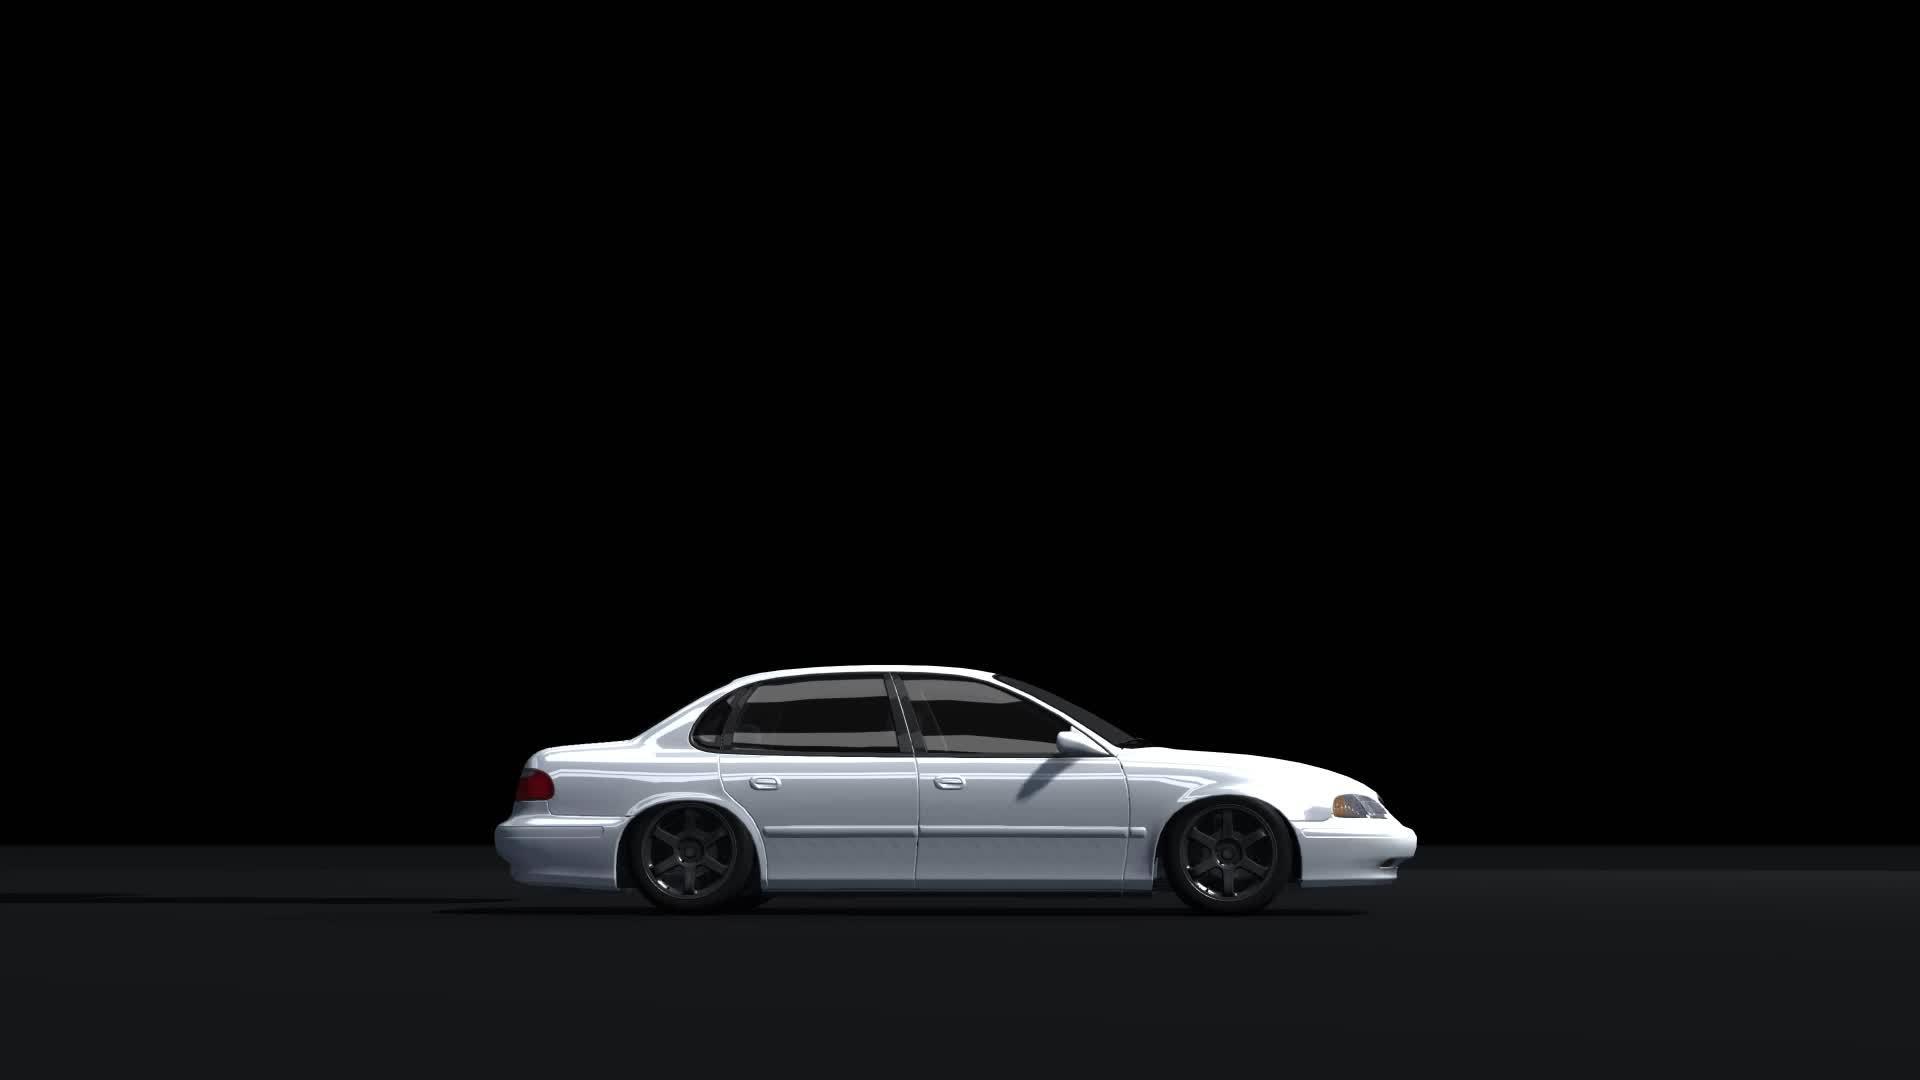 beamng 17 car pileup GIFs